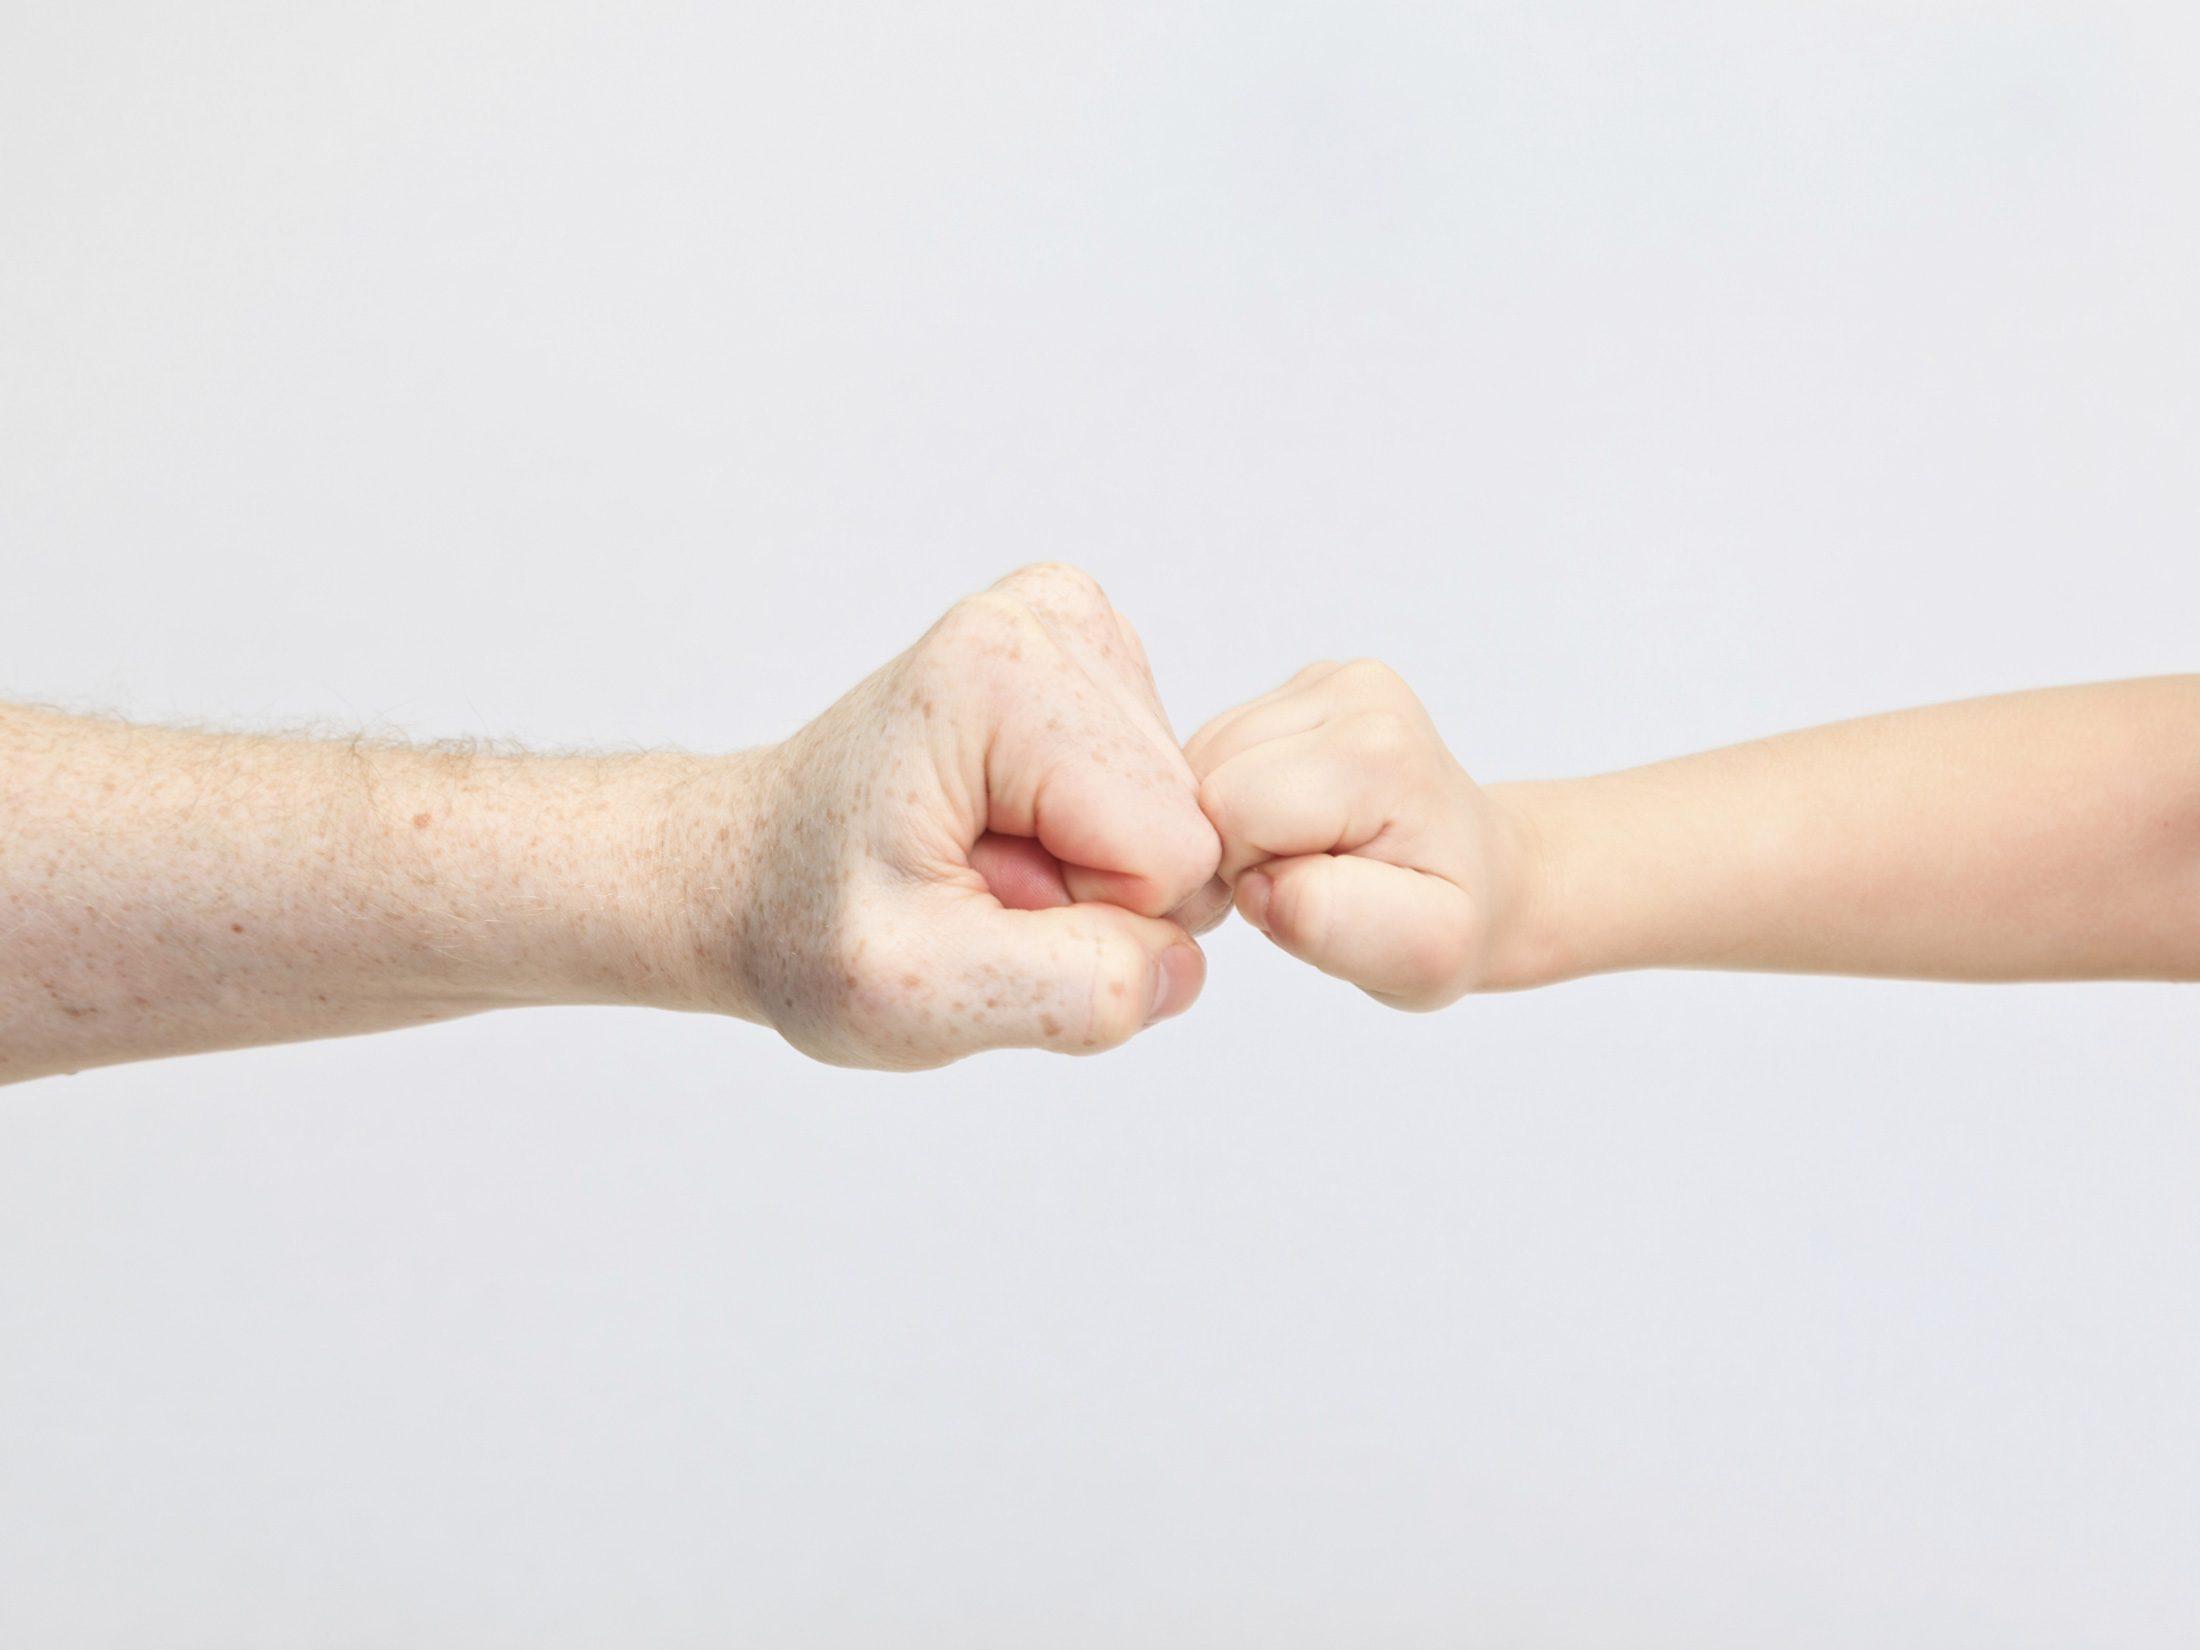 Encourage the Fist Bump